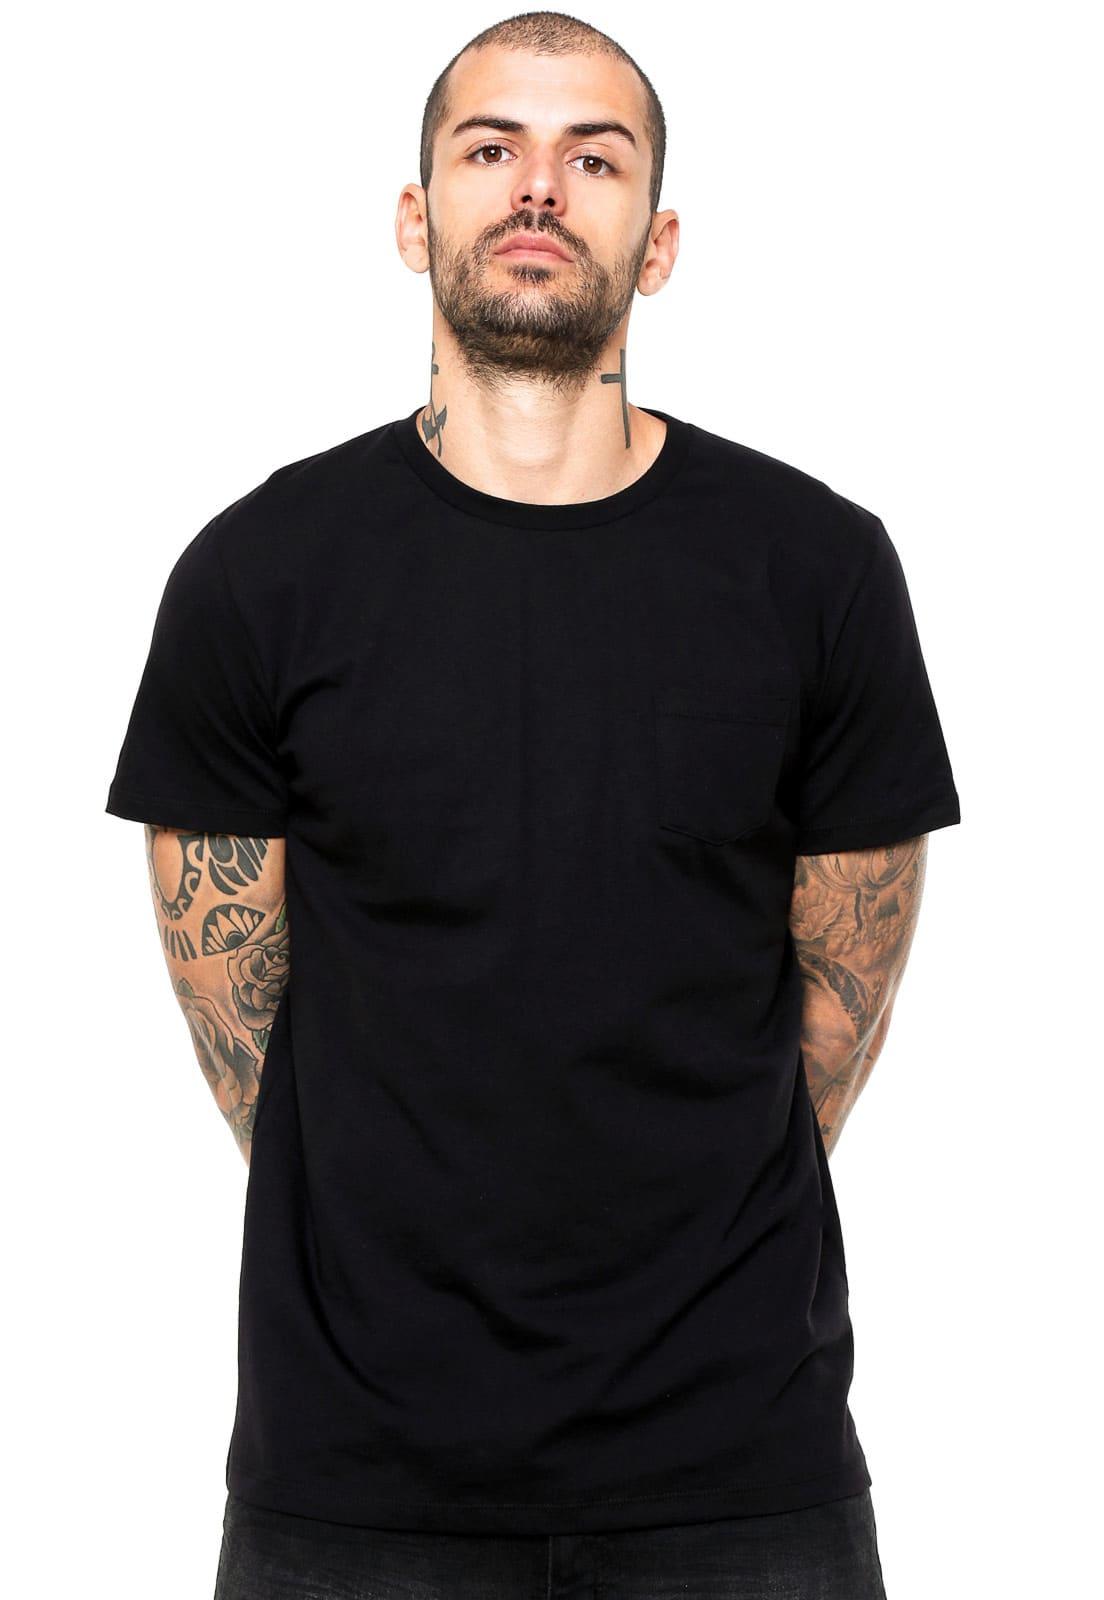 Camiseta Preta 100% Algodão Masculina Di Nuevo Street